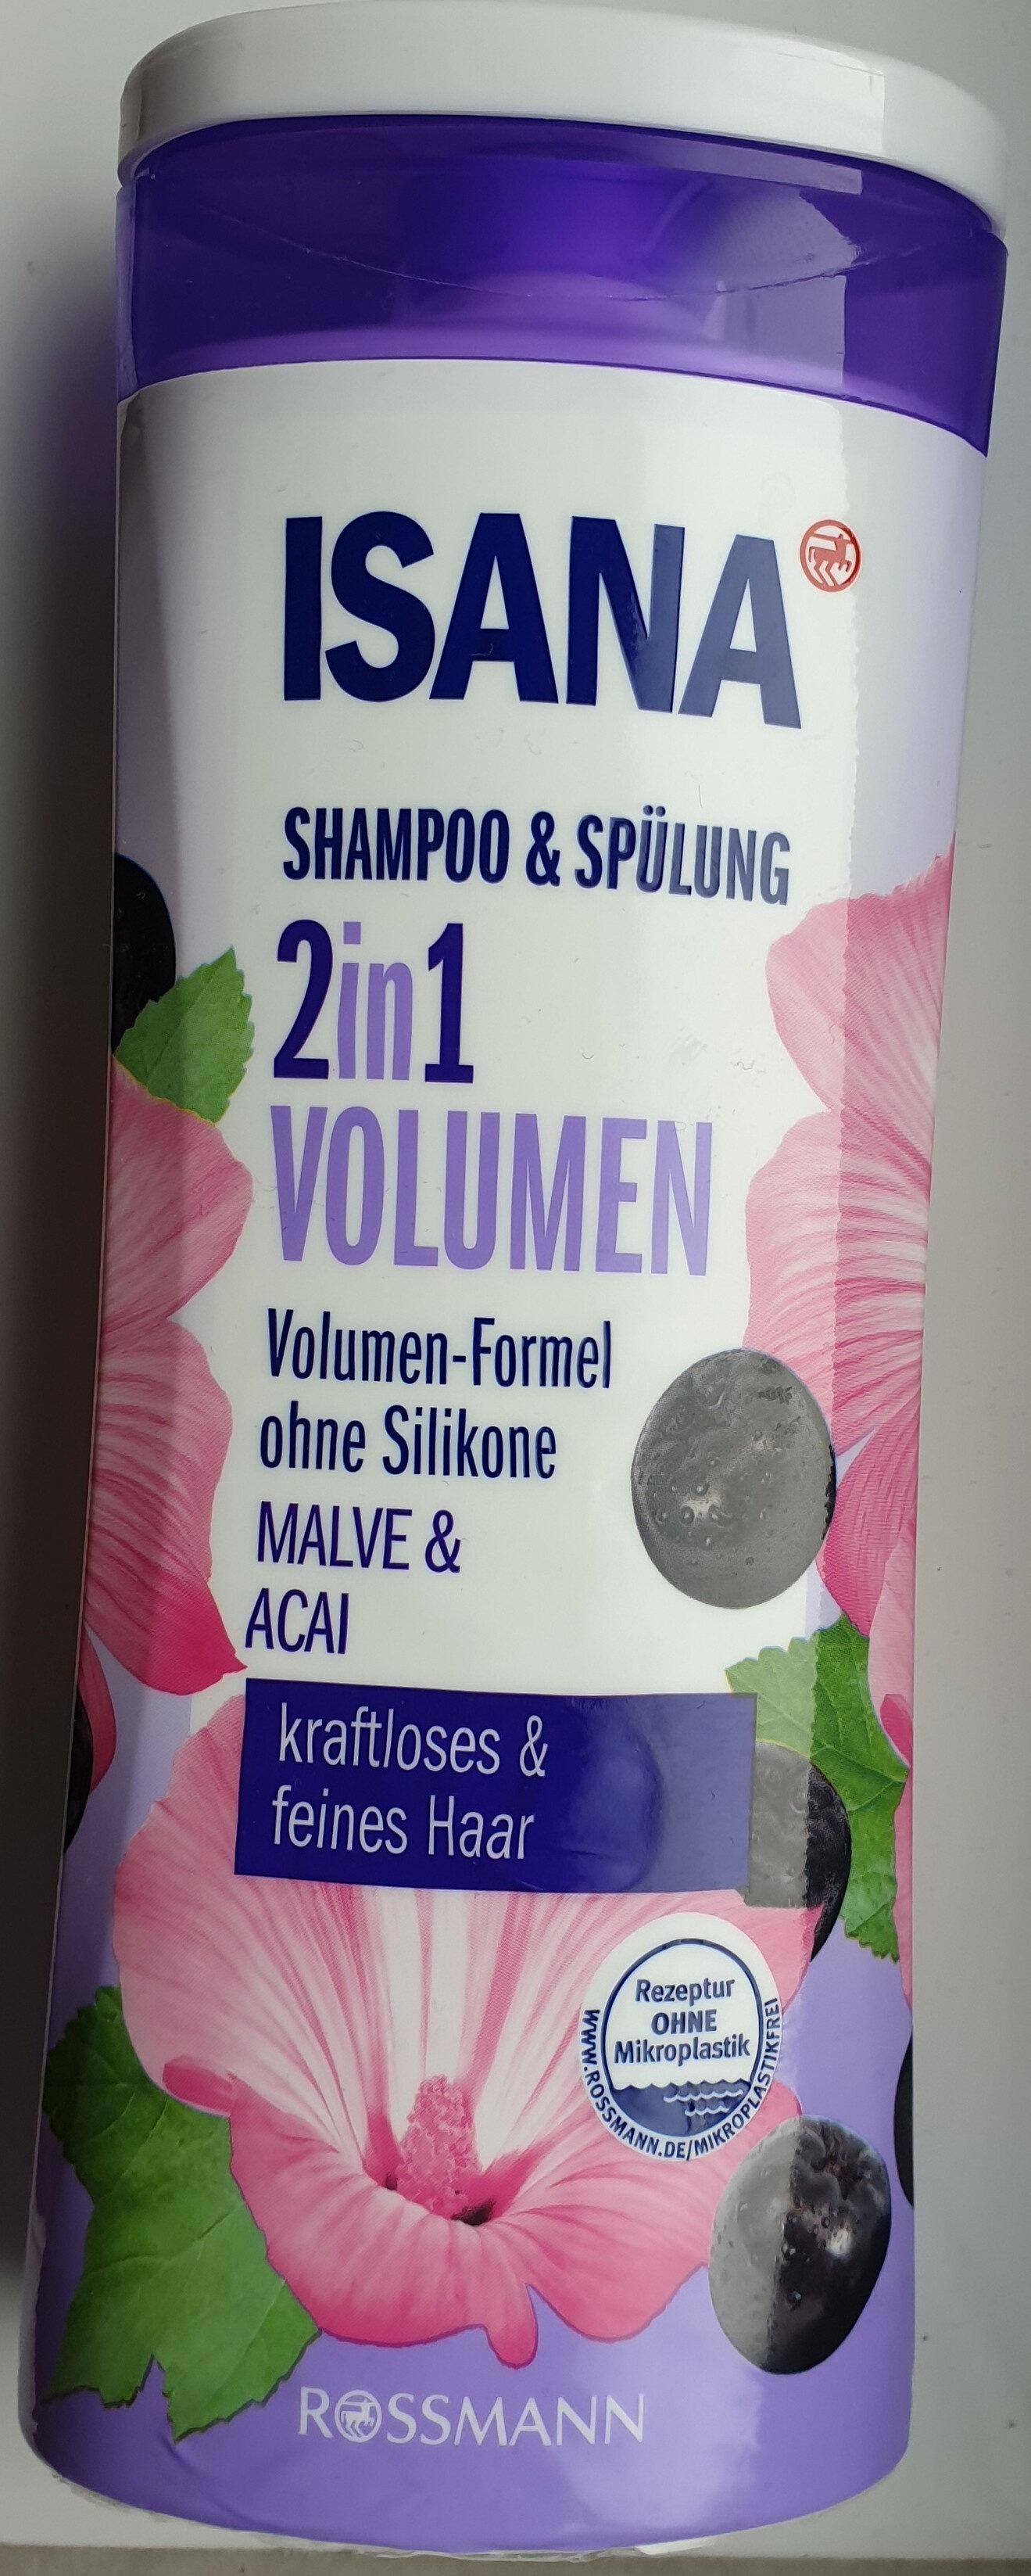 2in1 Volumen Shampoo & Spülung Malve & Acai - Produit - de